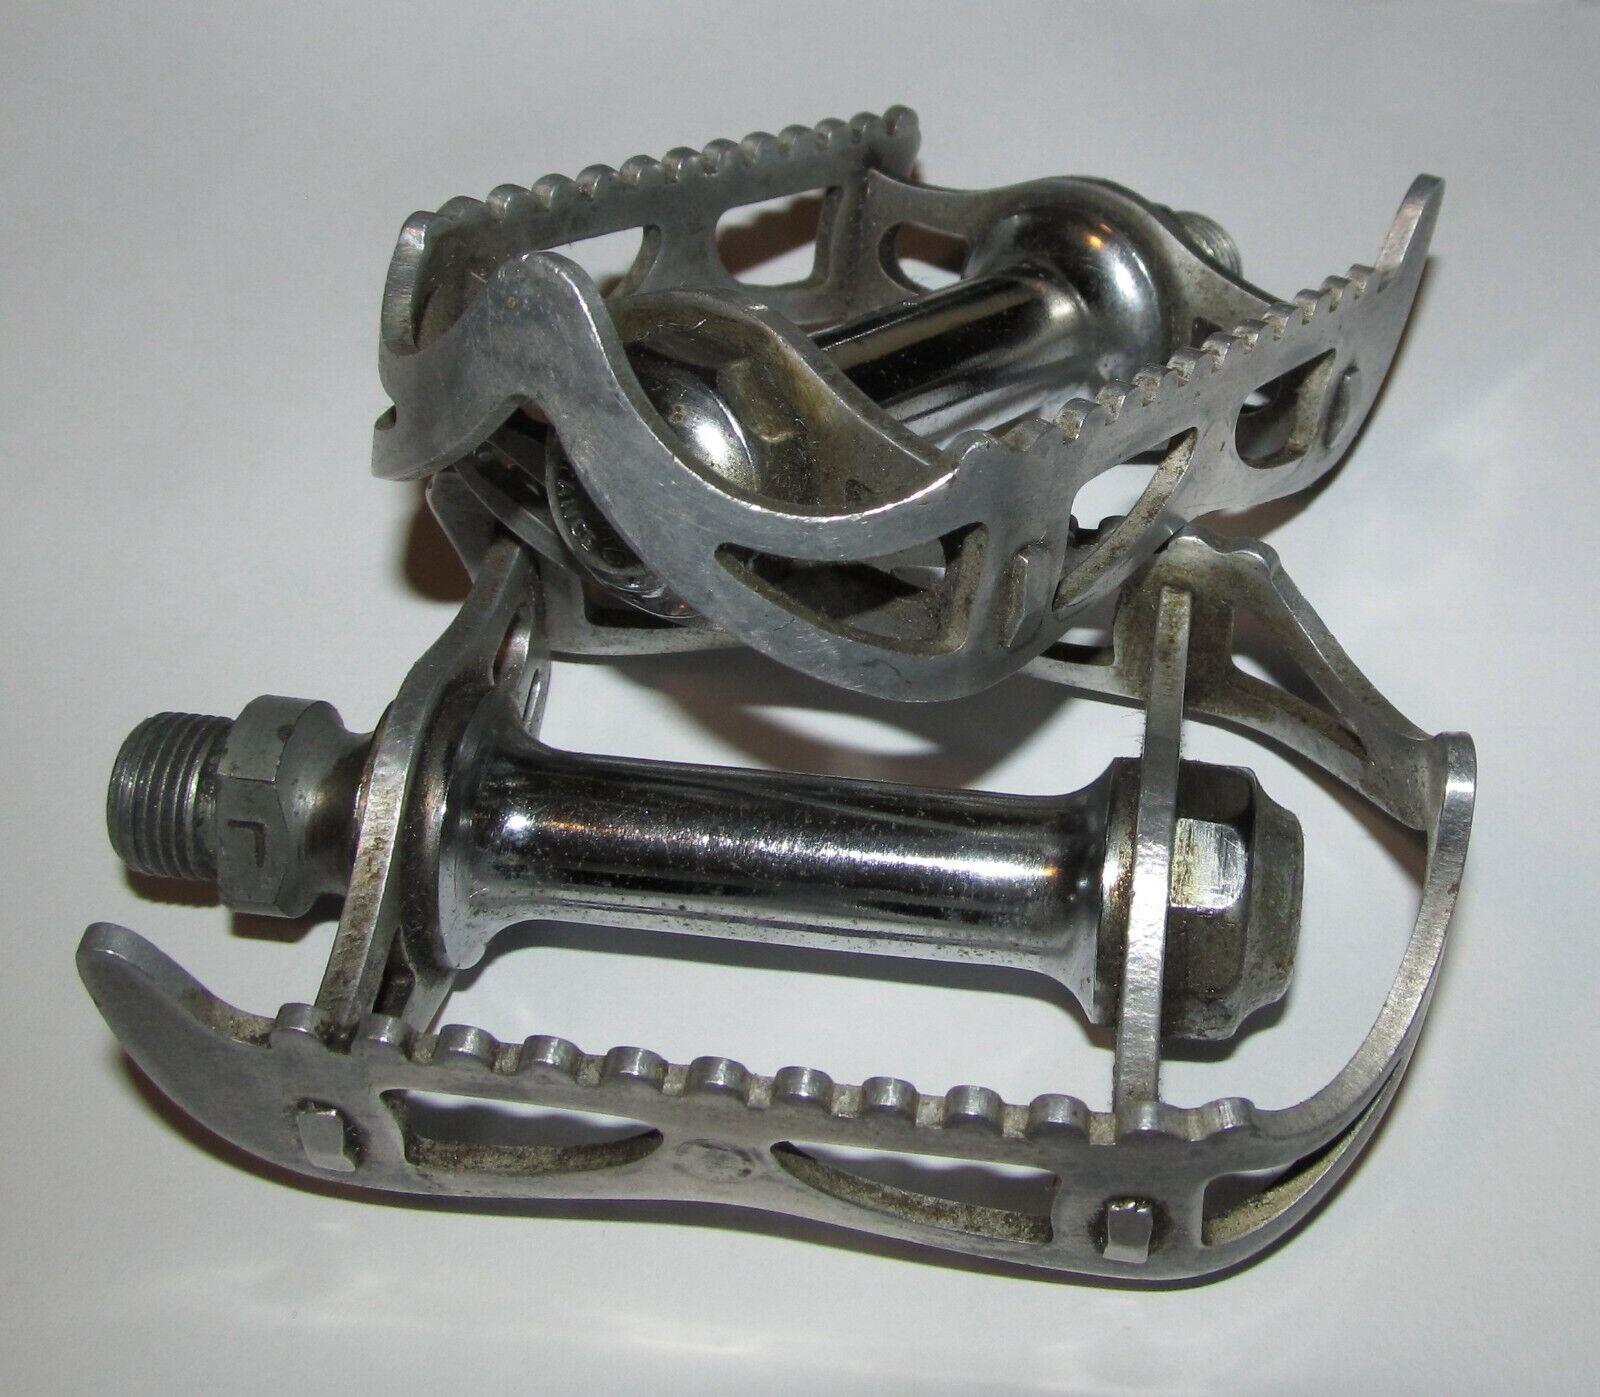 Lyotard modellololo N. 45CA 14 mm x 1.25 mm francese Filo Quill pedali